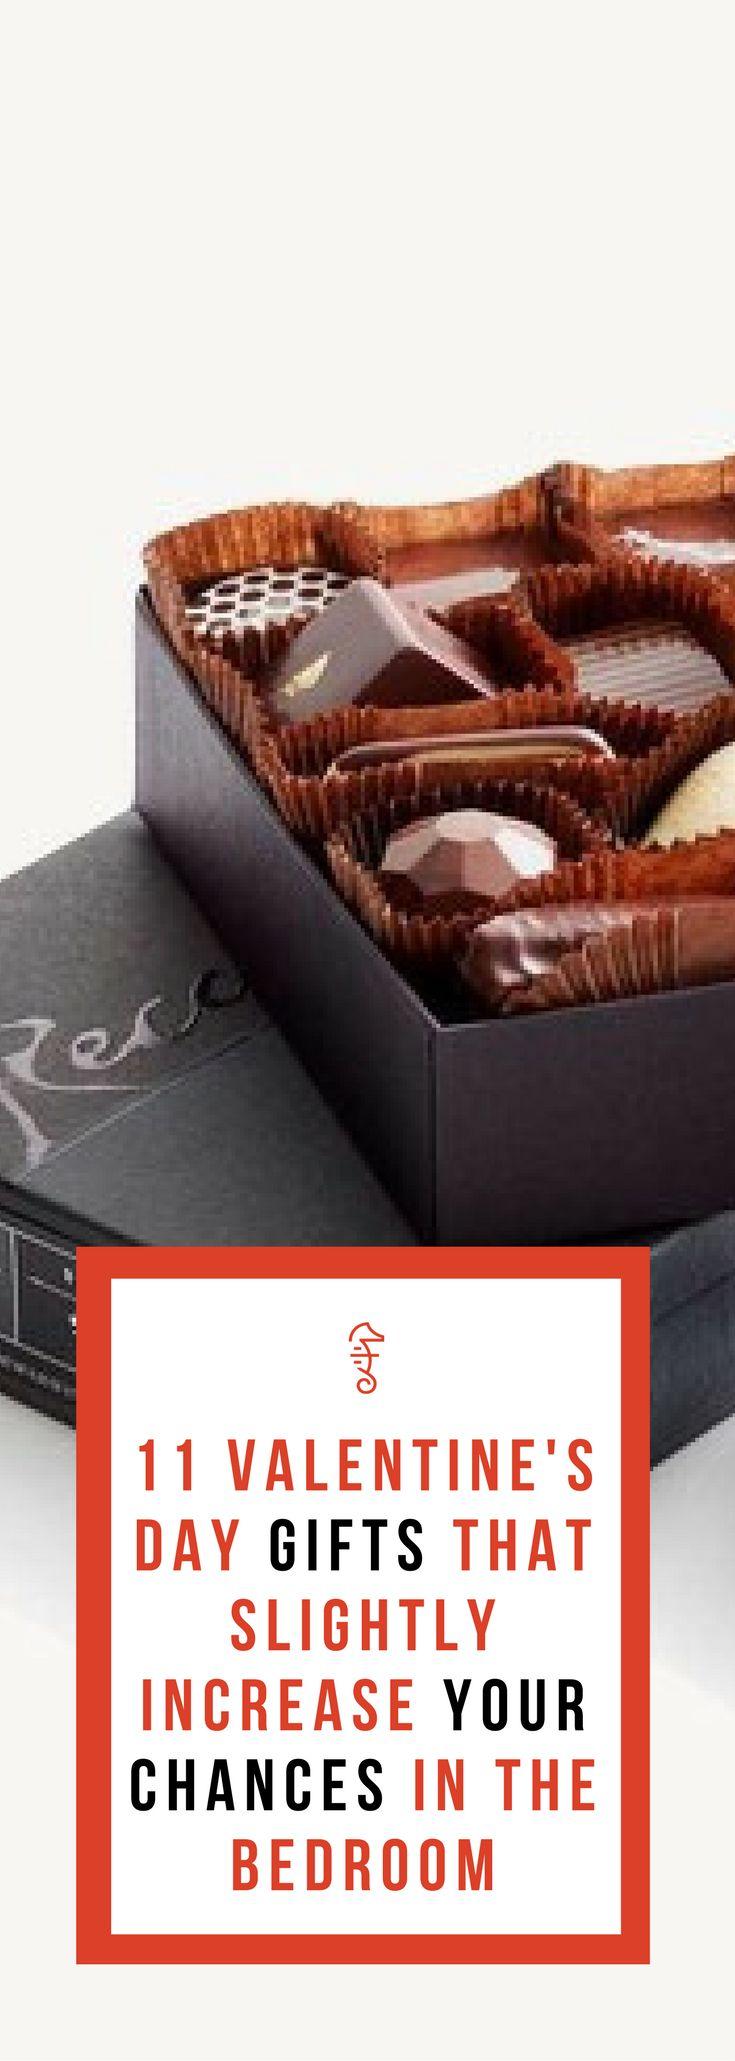 Valentines day, valetines day gifts, valentines day gifts for her, valetines day gifts romantic, valentines ideas